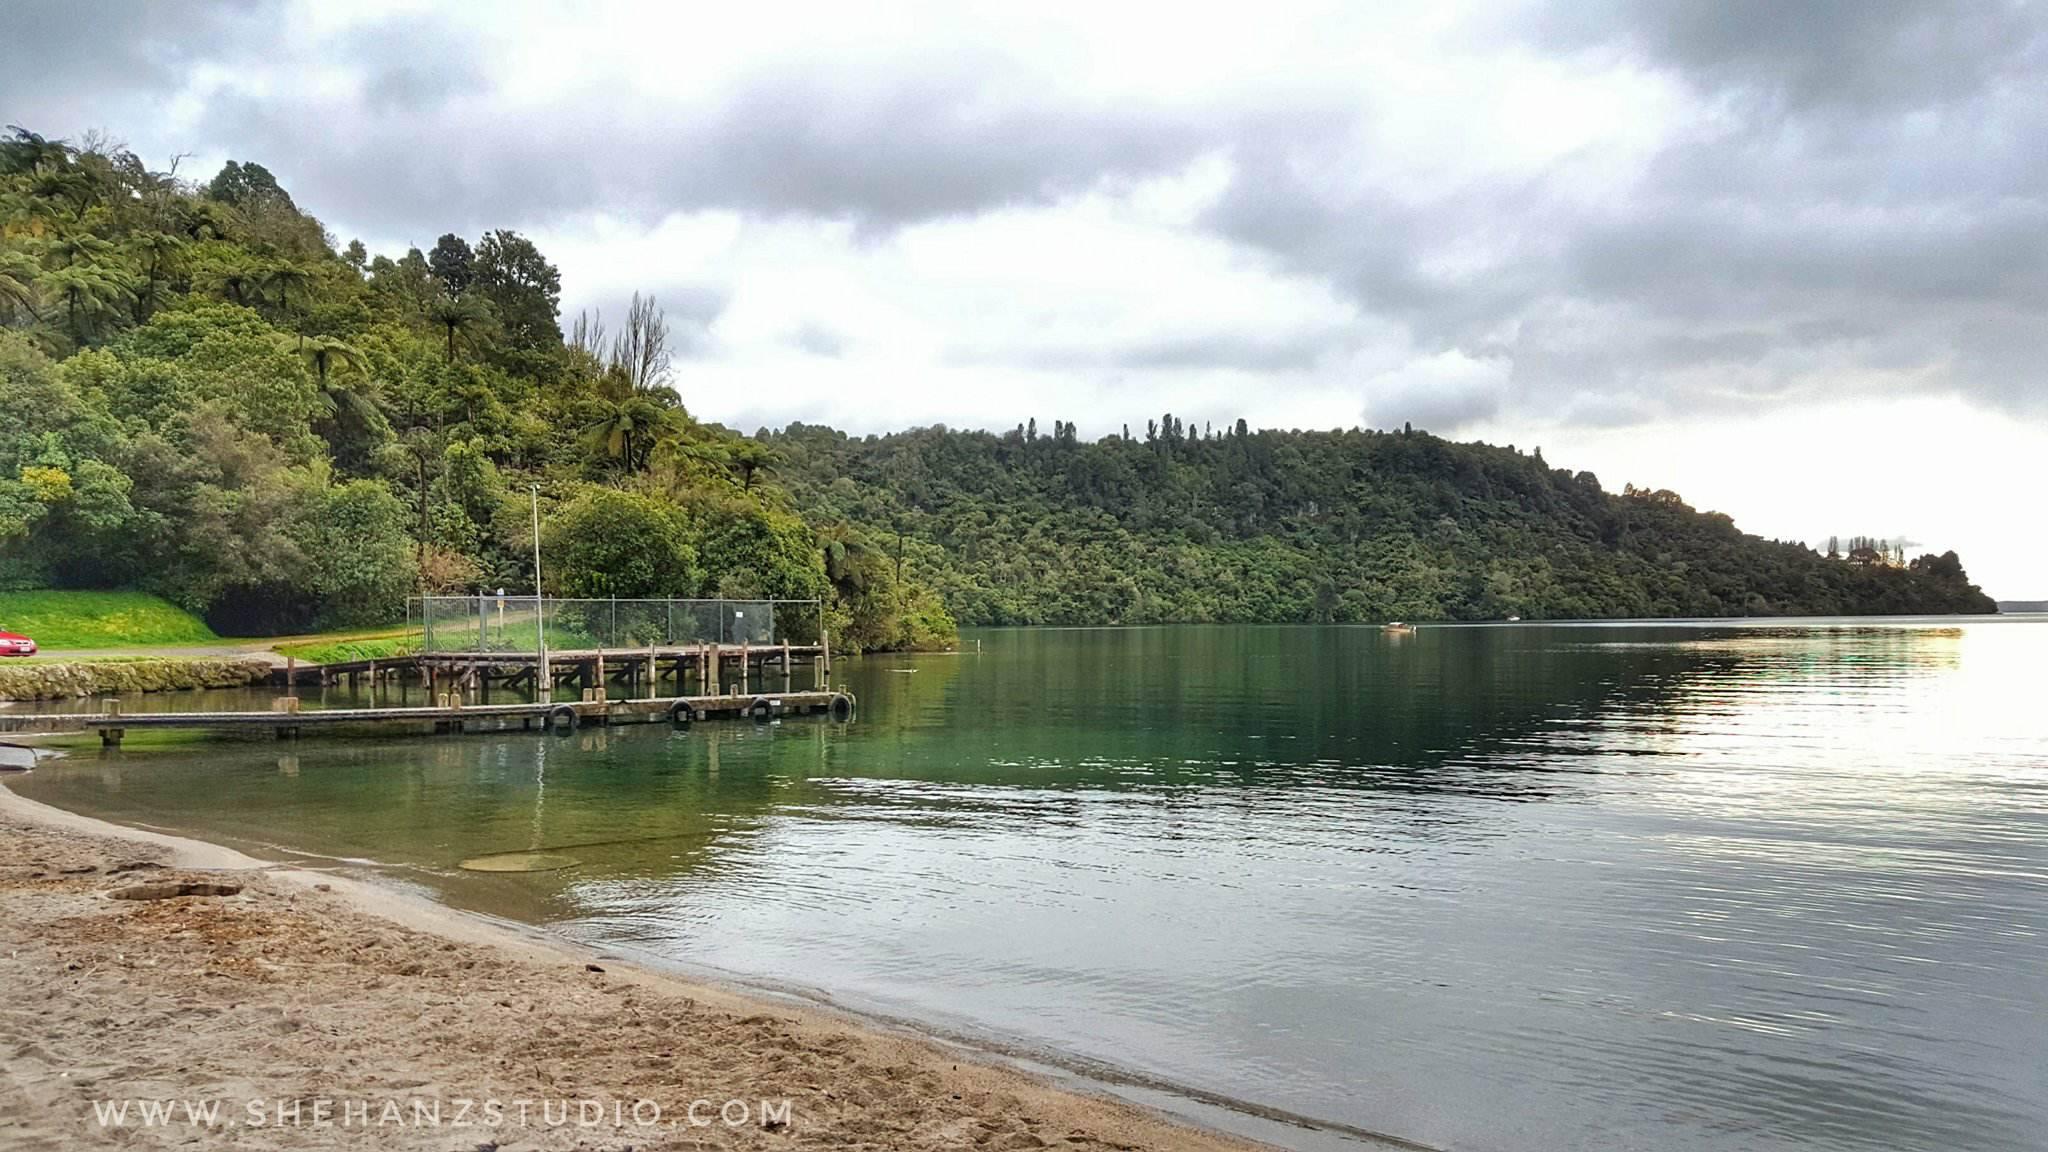 KEMBARA #KBBA9 COSMODERM - IKHLAS TOURS KE NEW ZEALAND BLUE LAKE, TARAWERA, AGRODOME AT ROTORUA (SPRING TIME) (PART 5) (1)